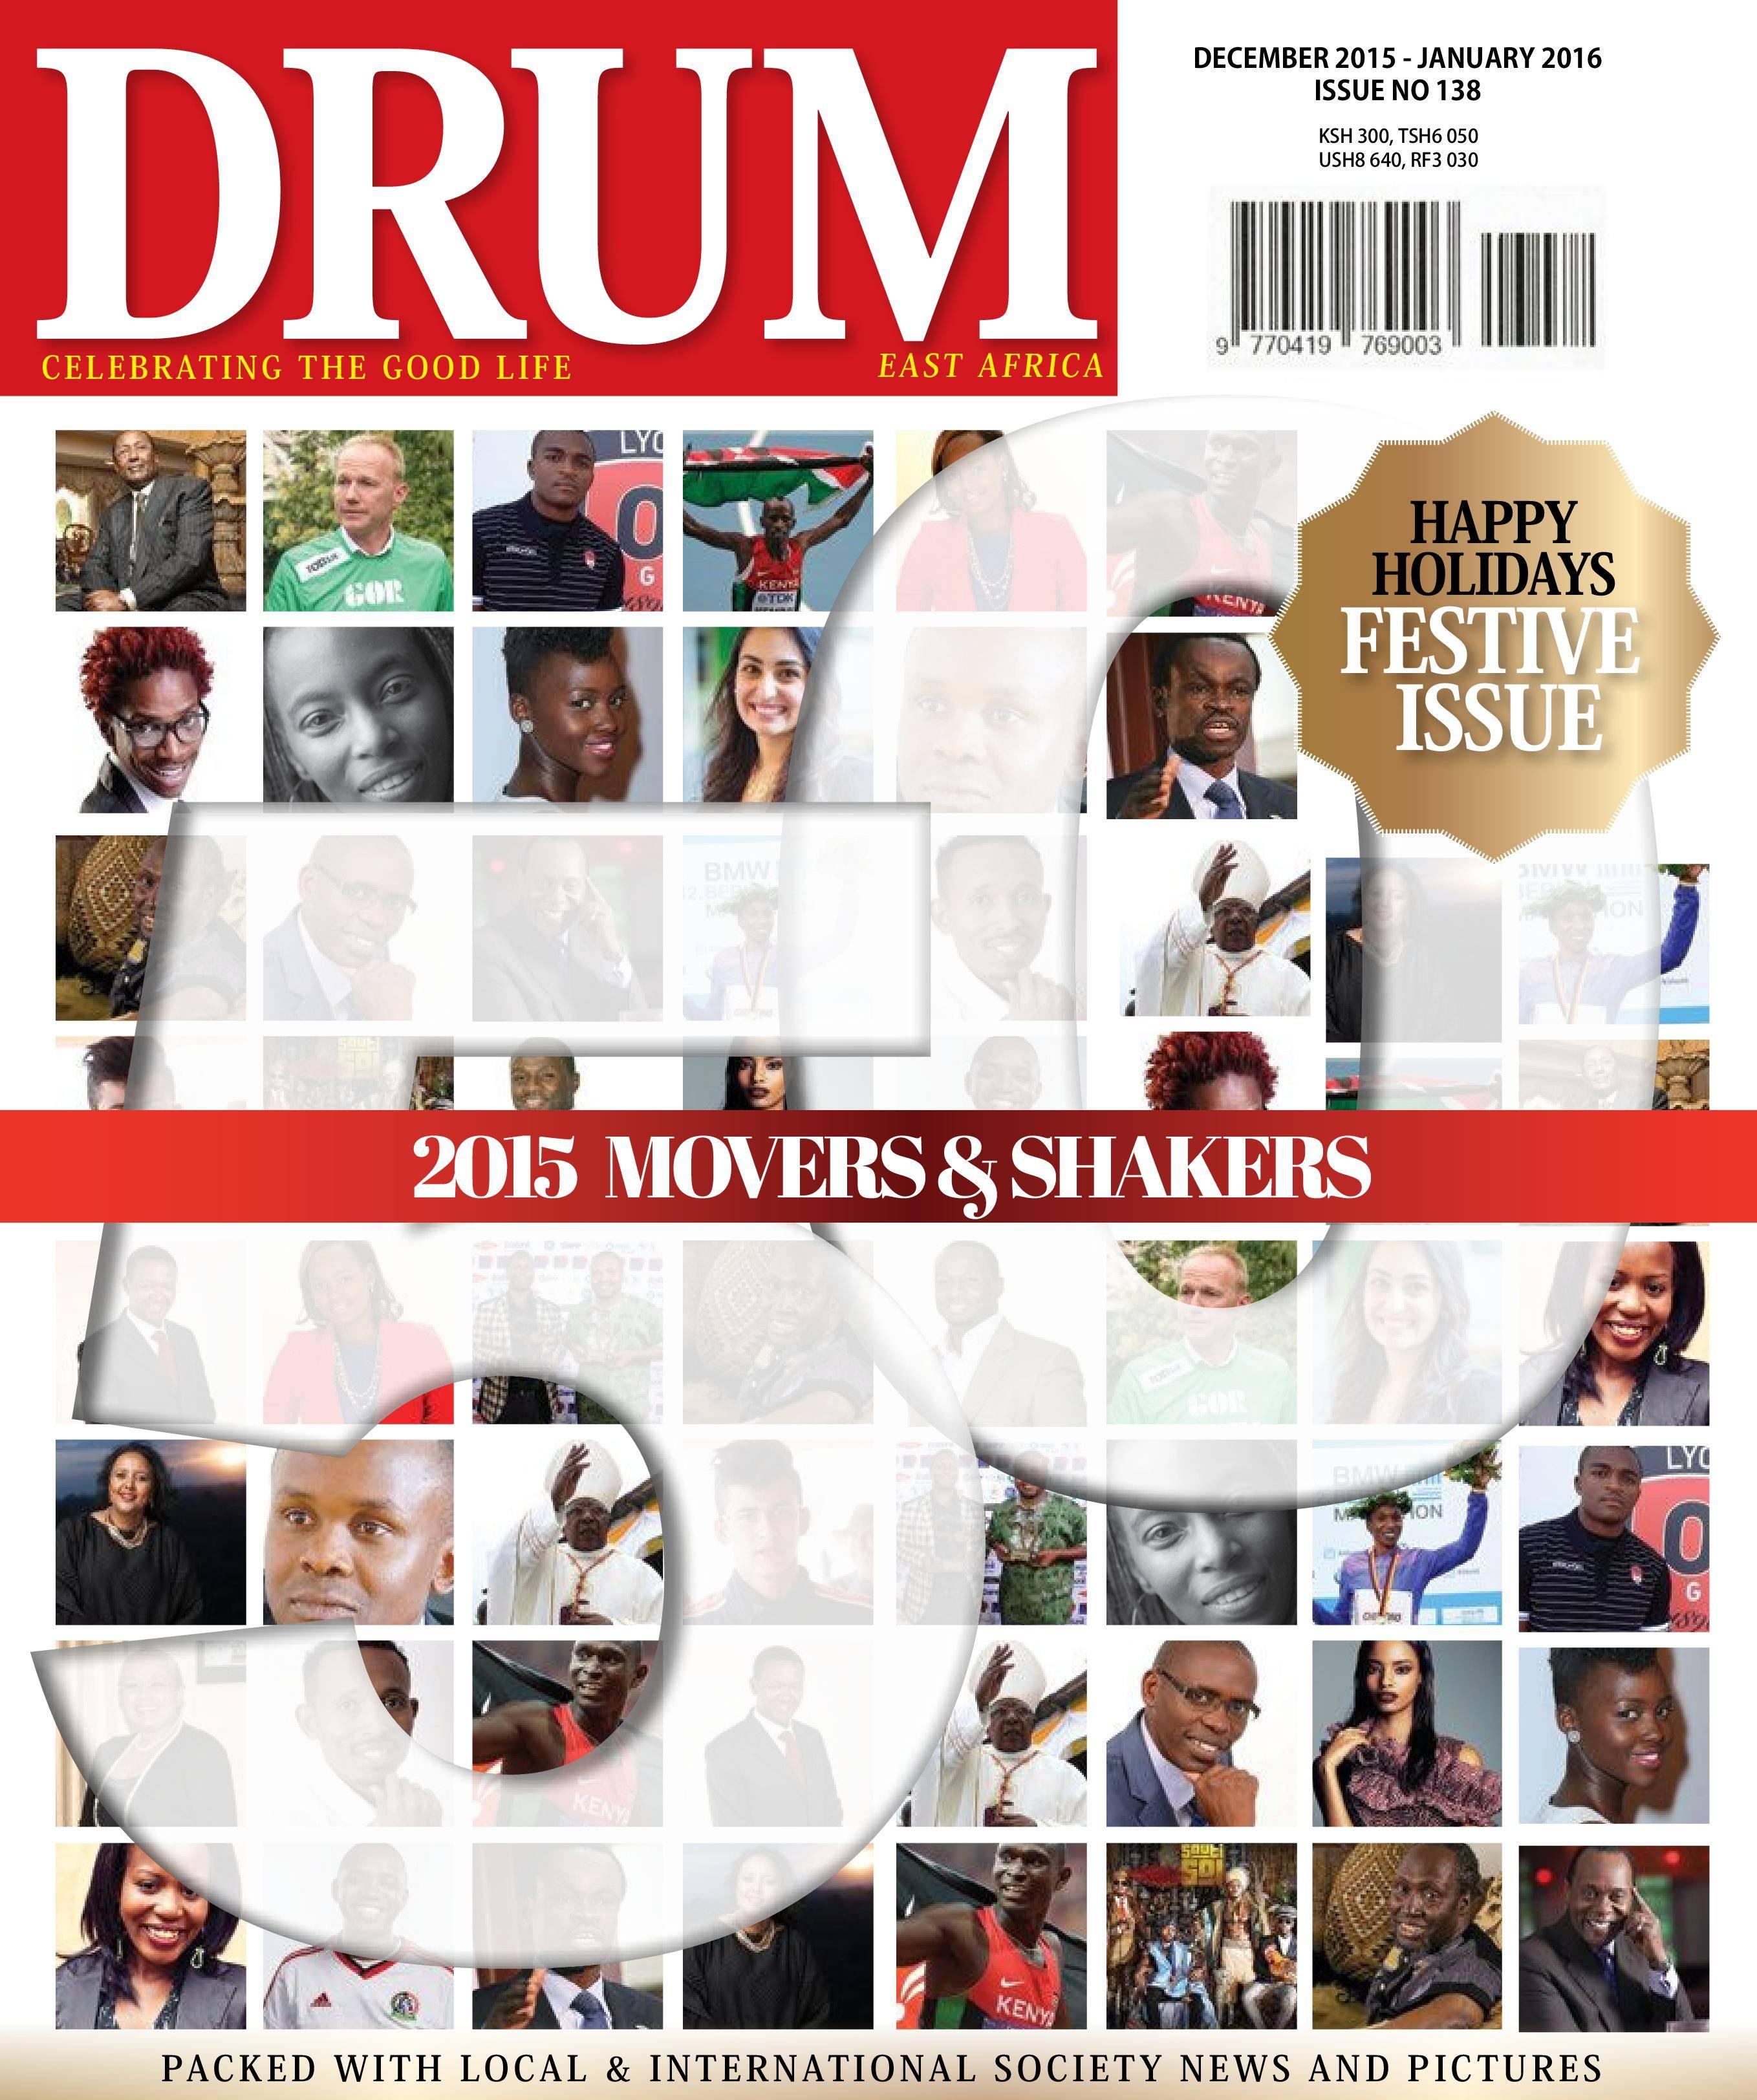 Drum East Africa - December 2015